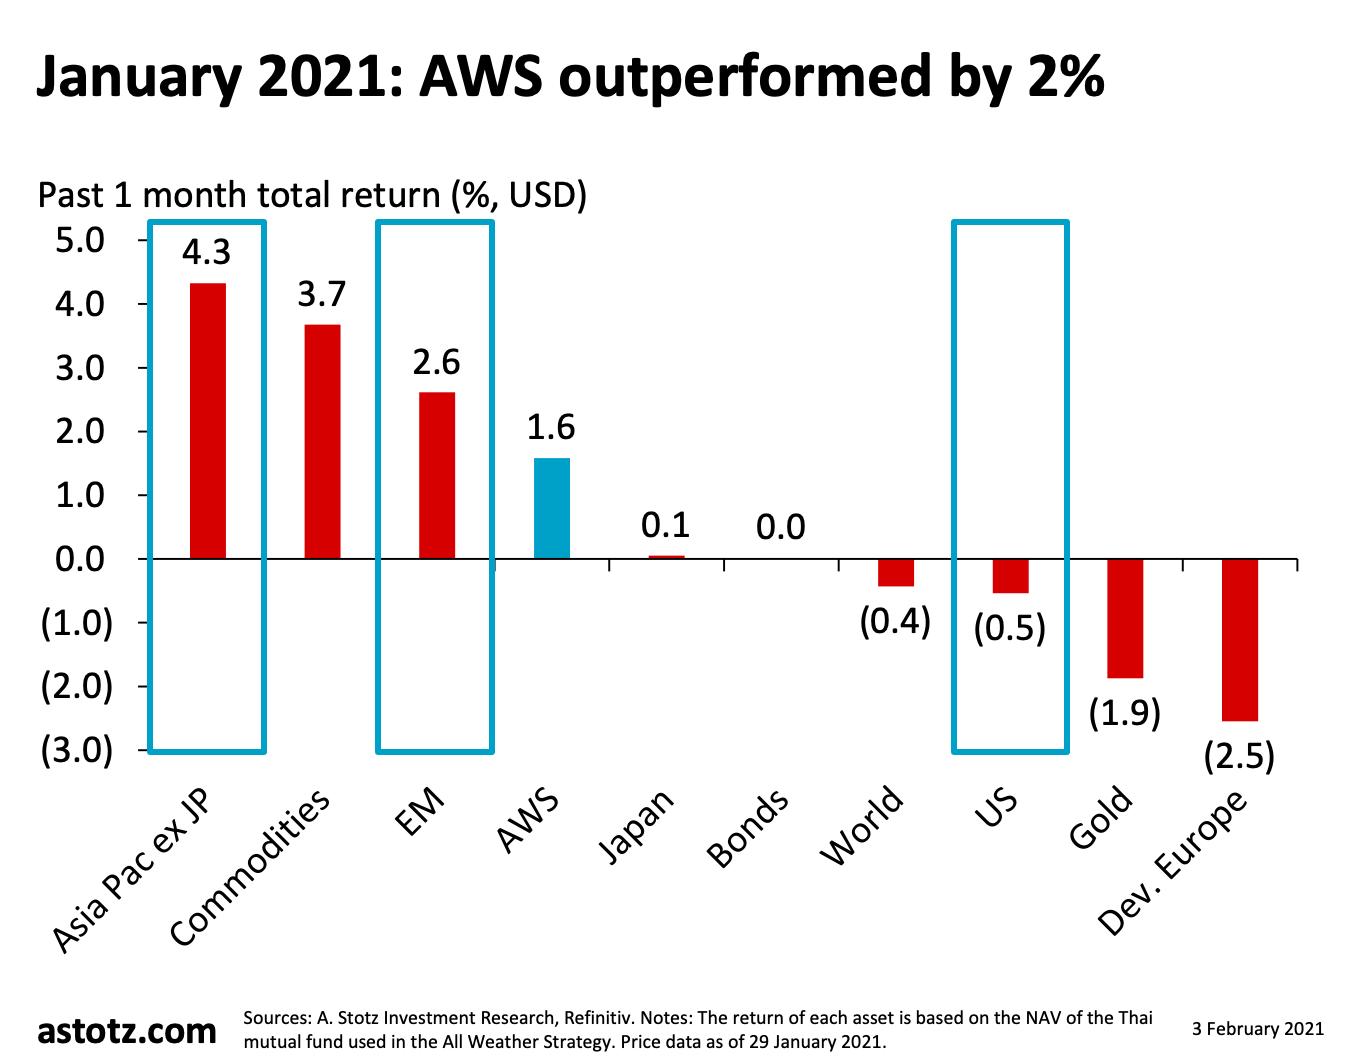 All Weather Strategy มกราคม 2021: ตลาดเกิดใหม่ และเอเชีย-แปซิฟิก (ไม่รวมญี่ปุ่น) หนุนให้ชนะหุ้นโลก